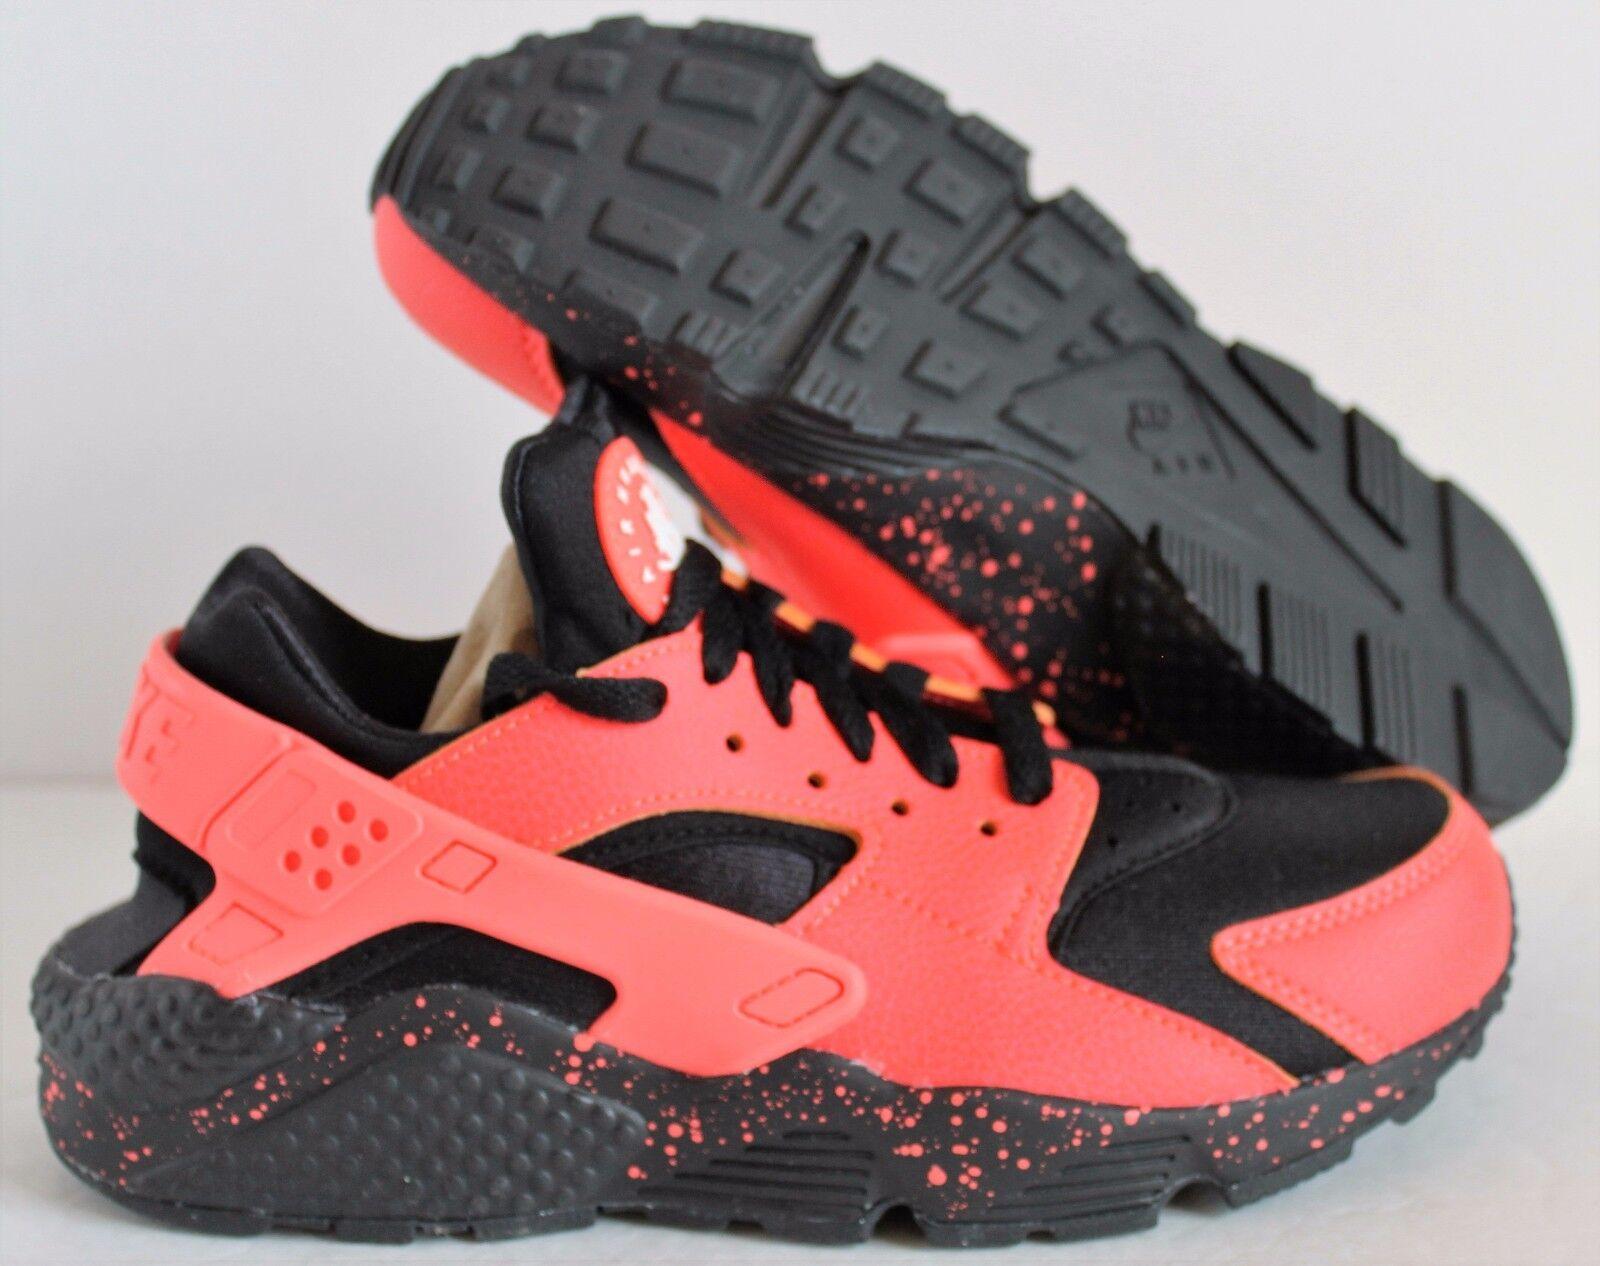 Nike femmes Huarache Premium ID Hot Lava- Noir SZ 7 [777331-994]